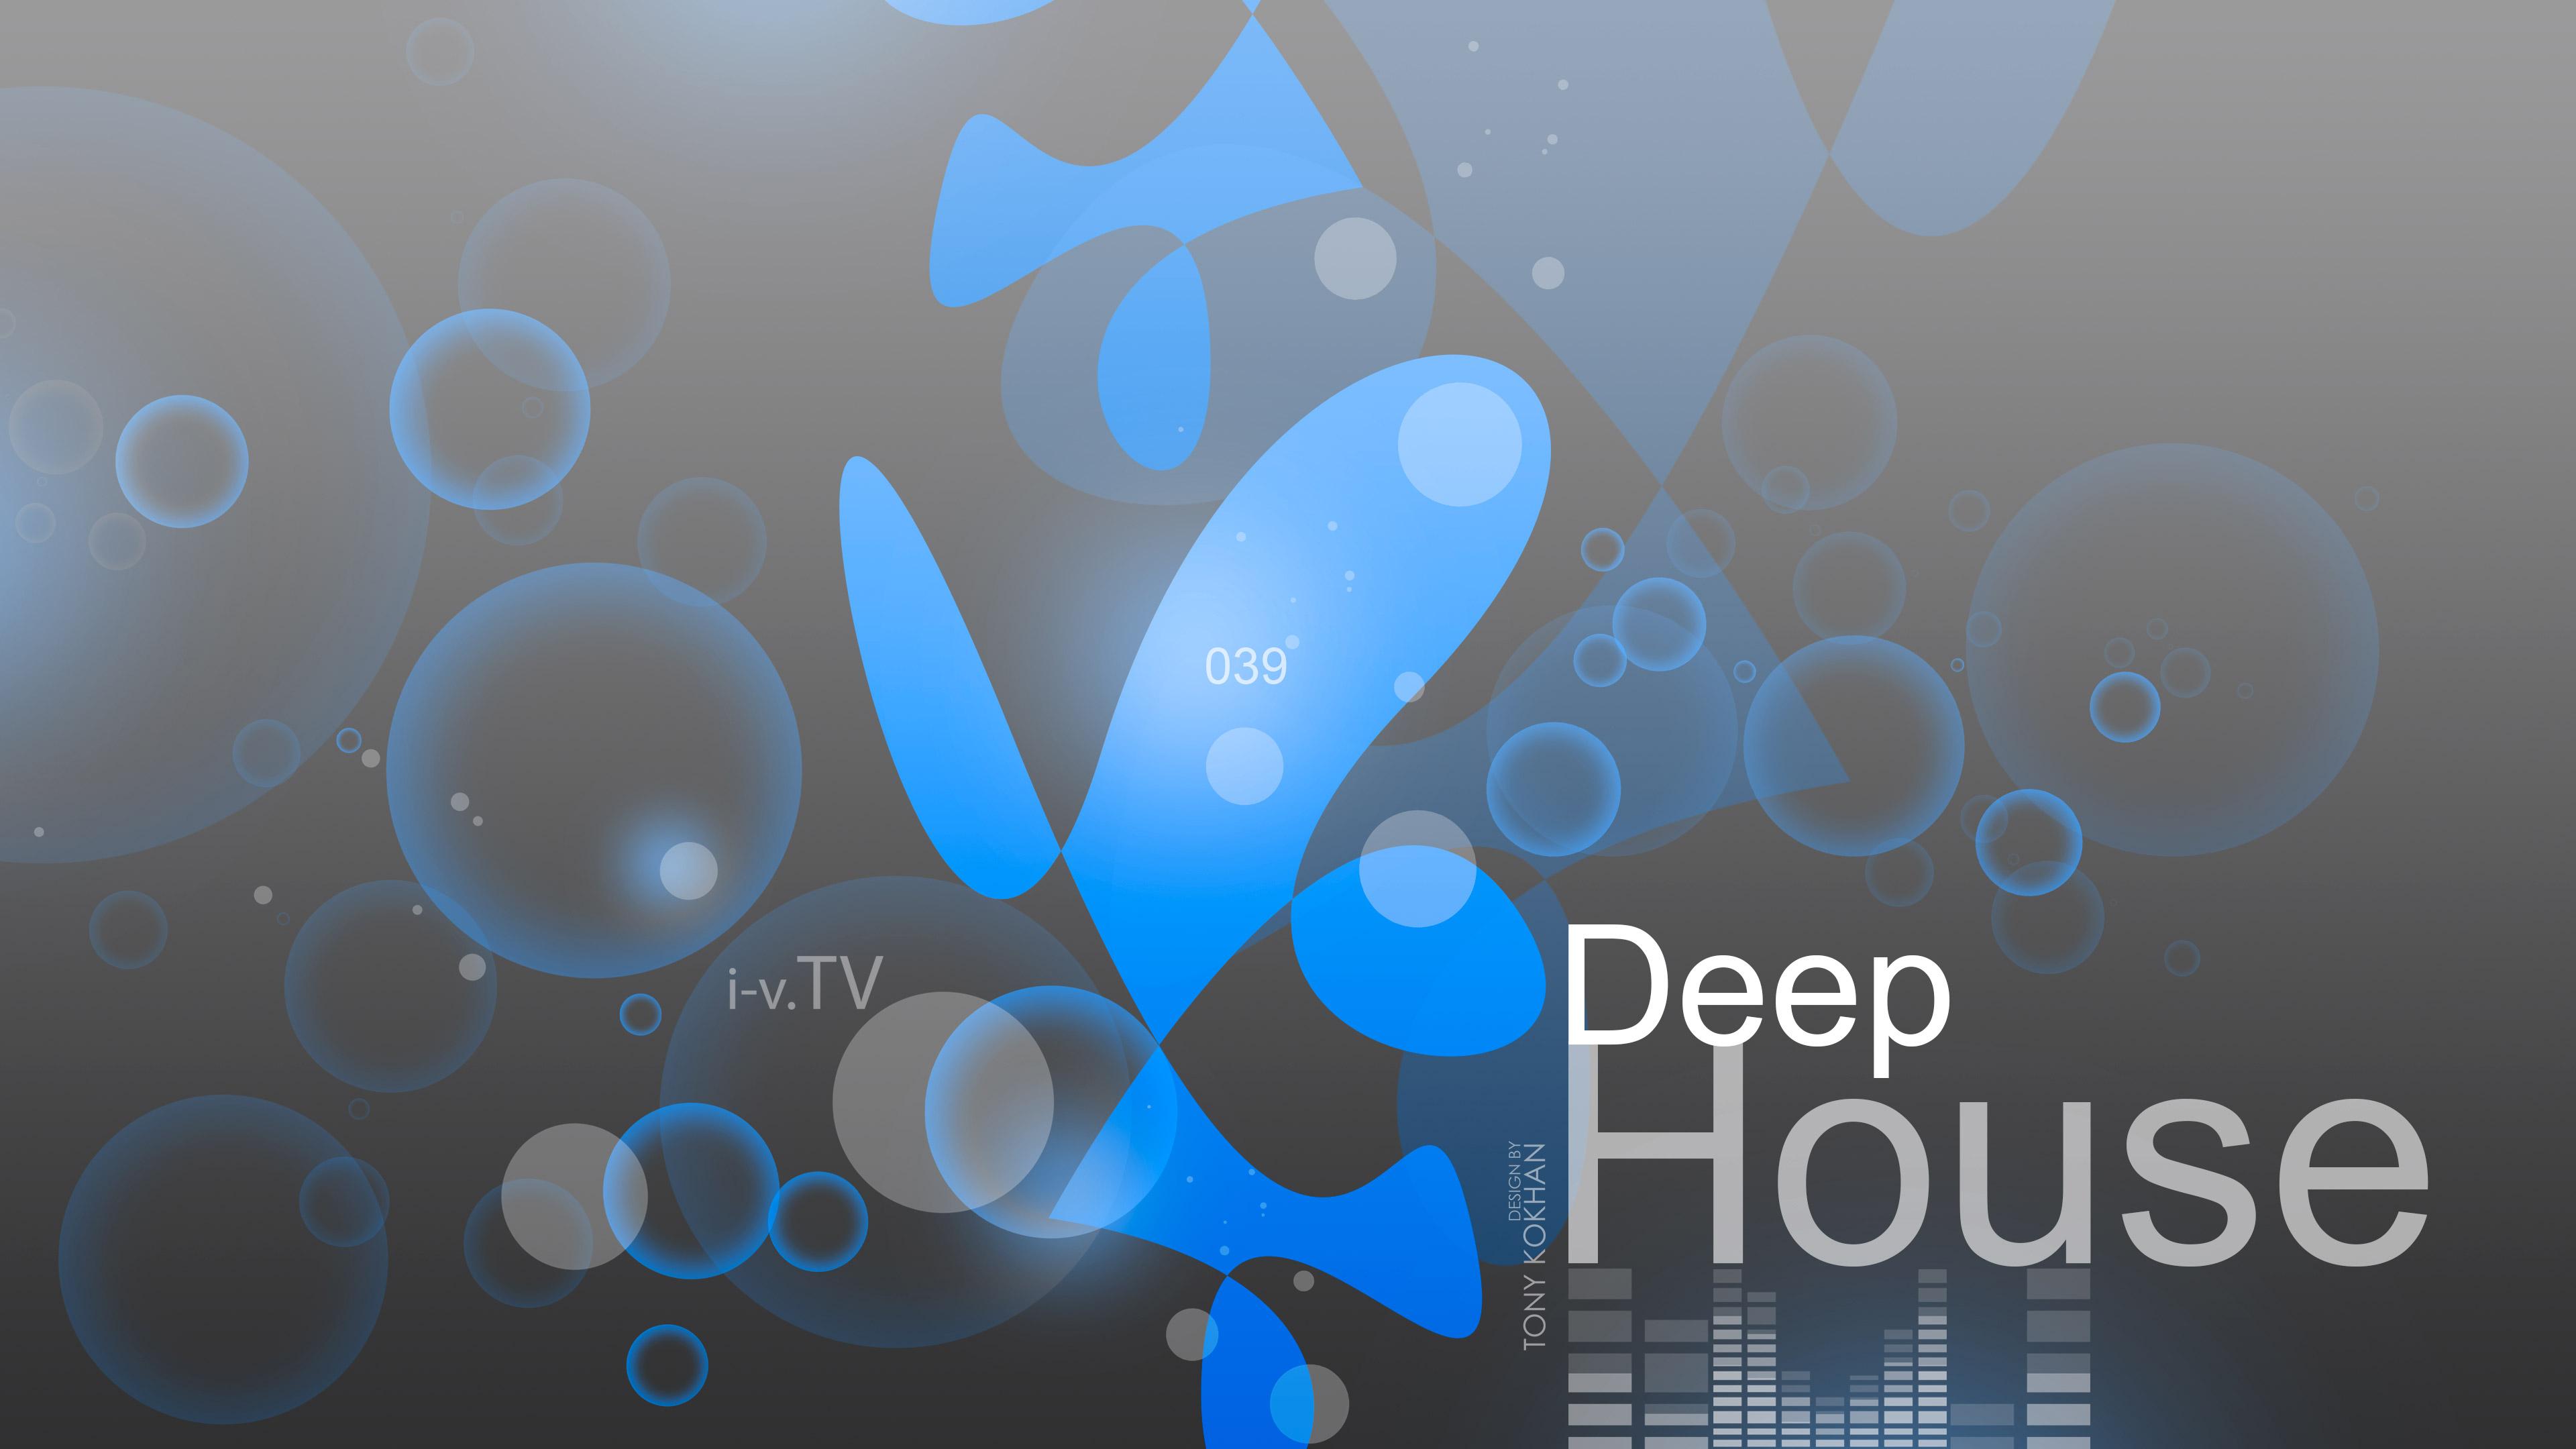 Deep House Music eQ SC Thirty Nine 2015 Tony Kokhan Sound 3840x2160